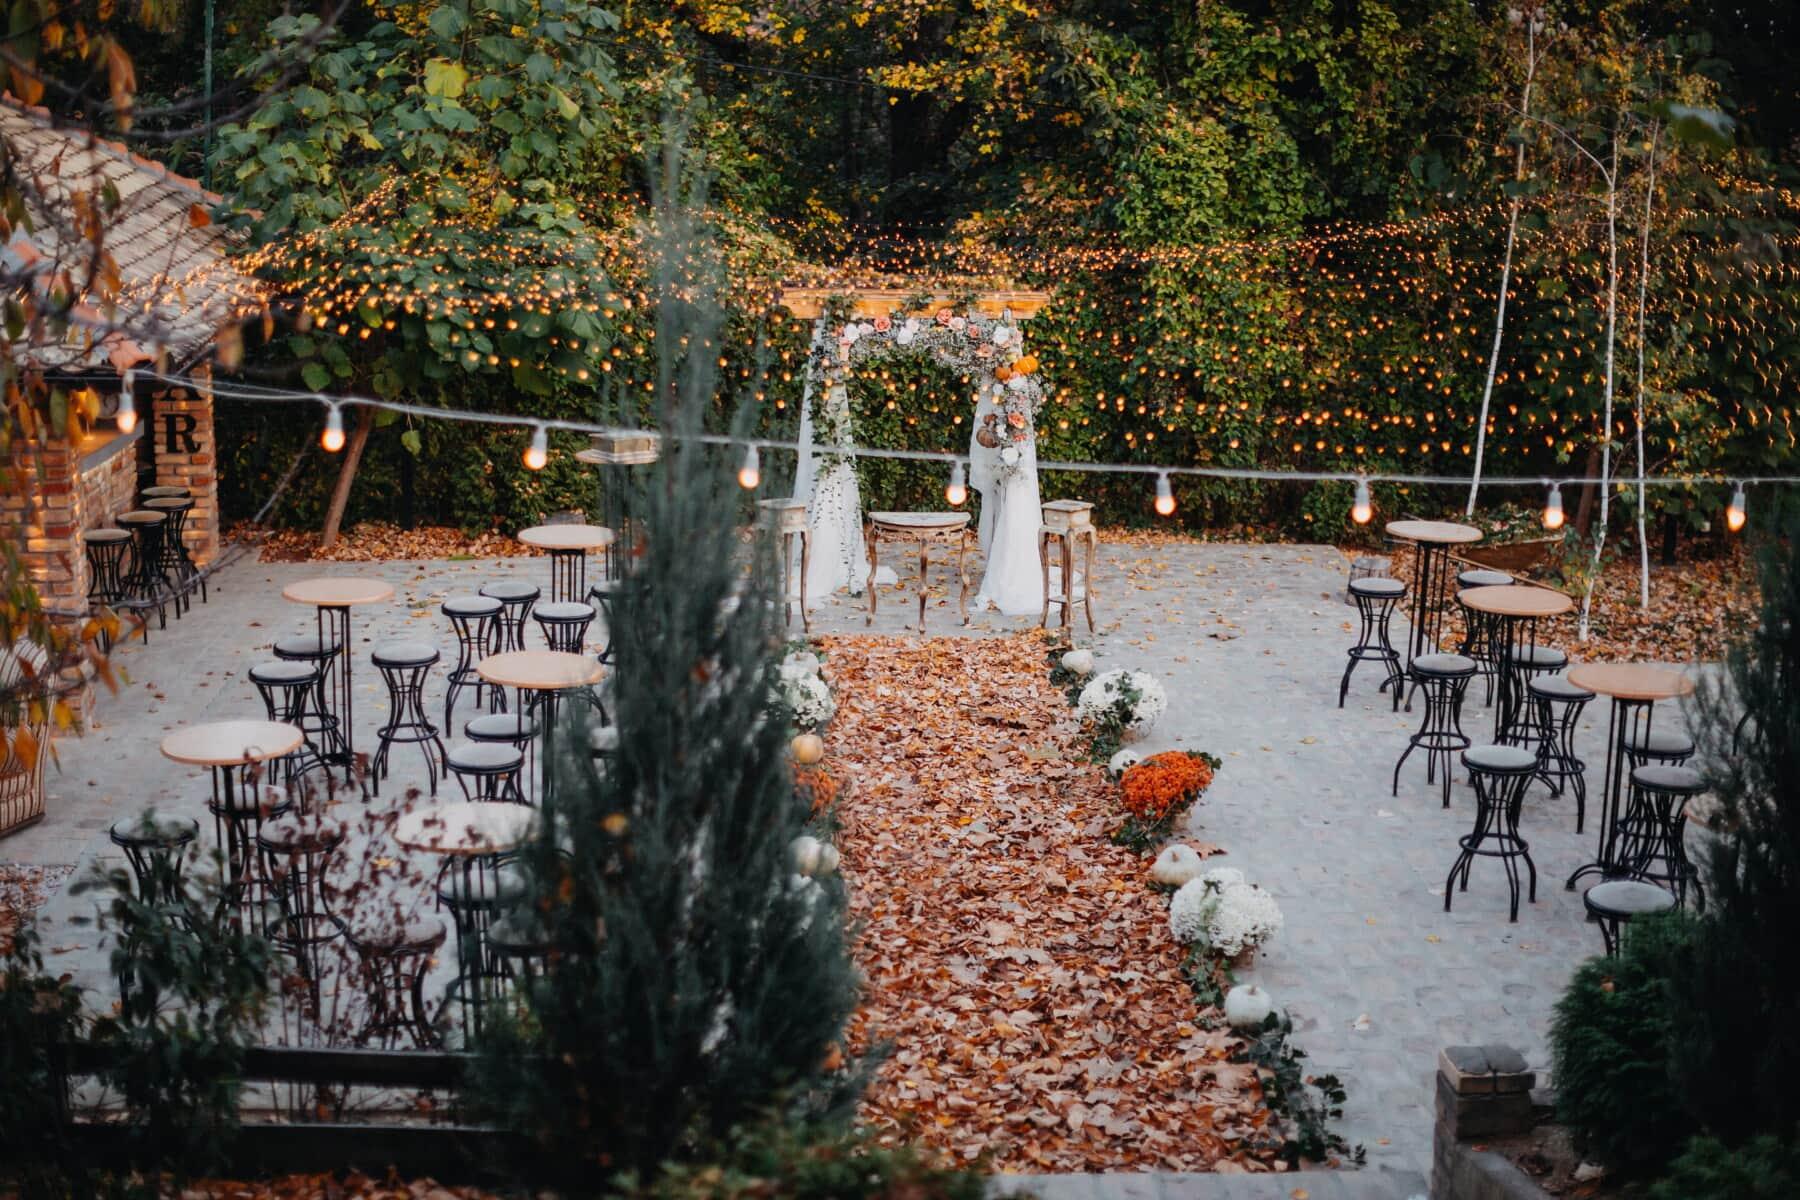 wedding venue, backyard, cafeteria, furniture, garden, decoration, light bulb, tree, outdoors, nature